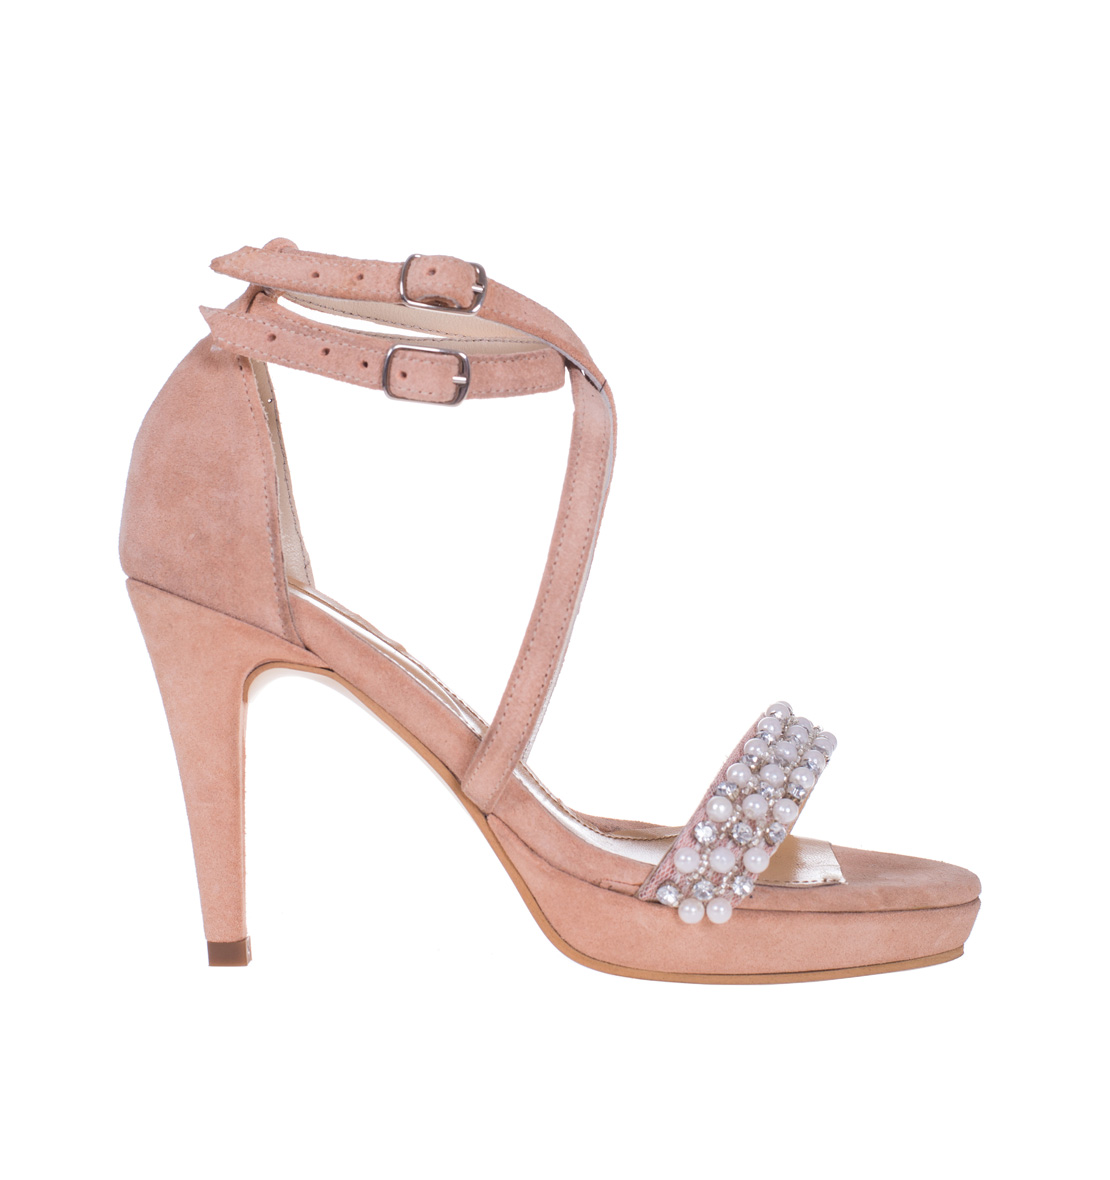 Sandale Roz Pal Perle